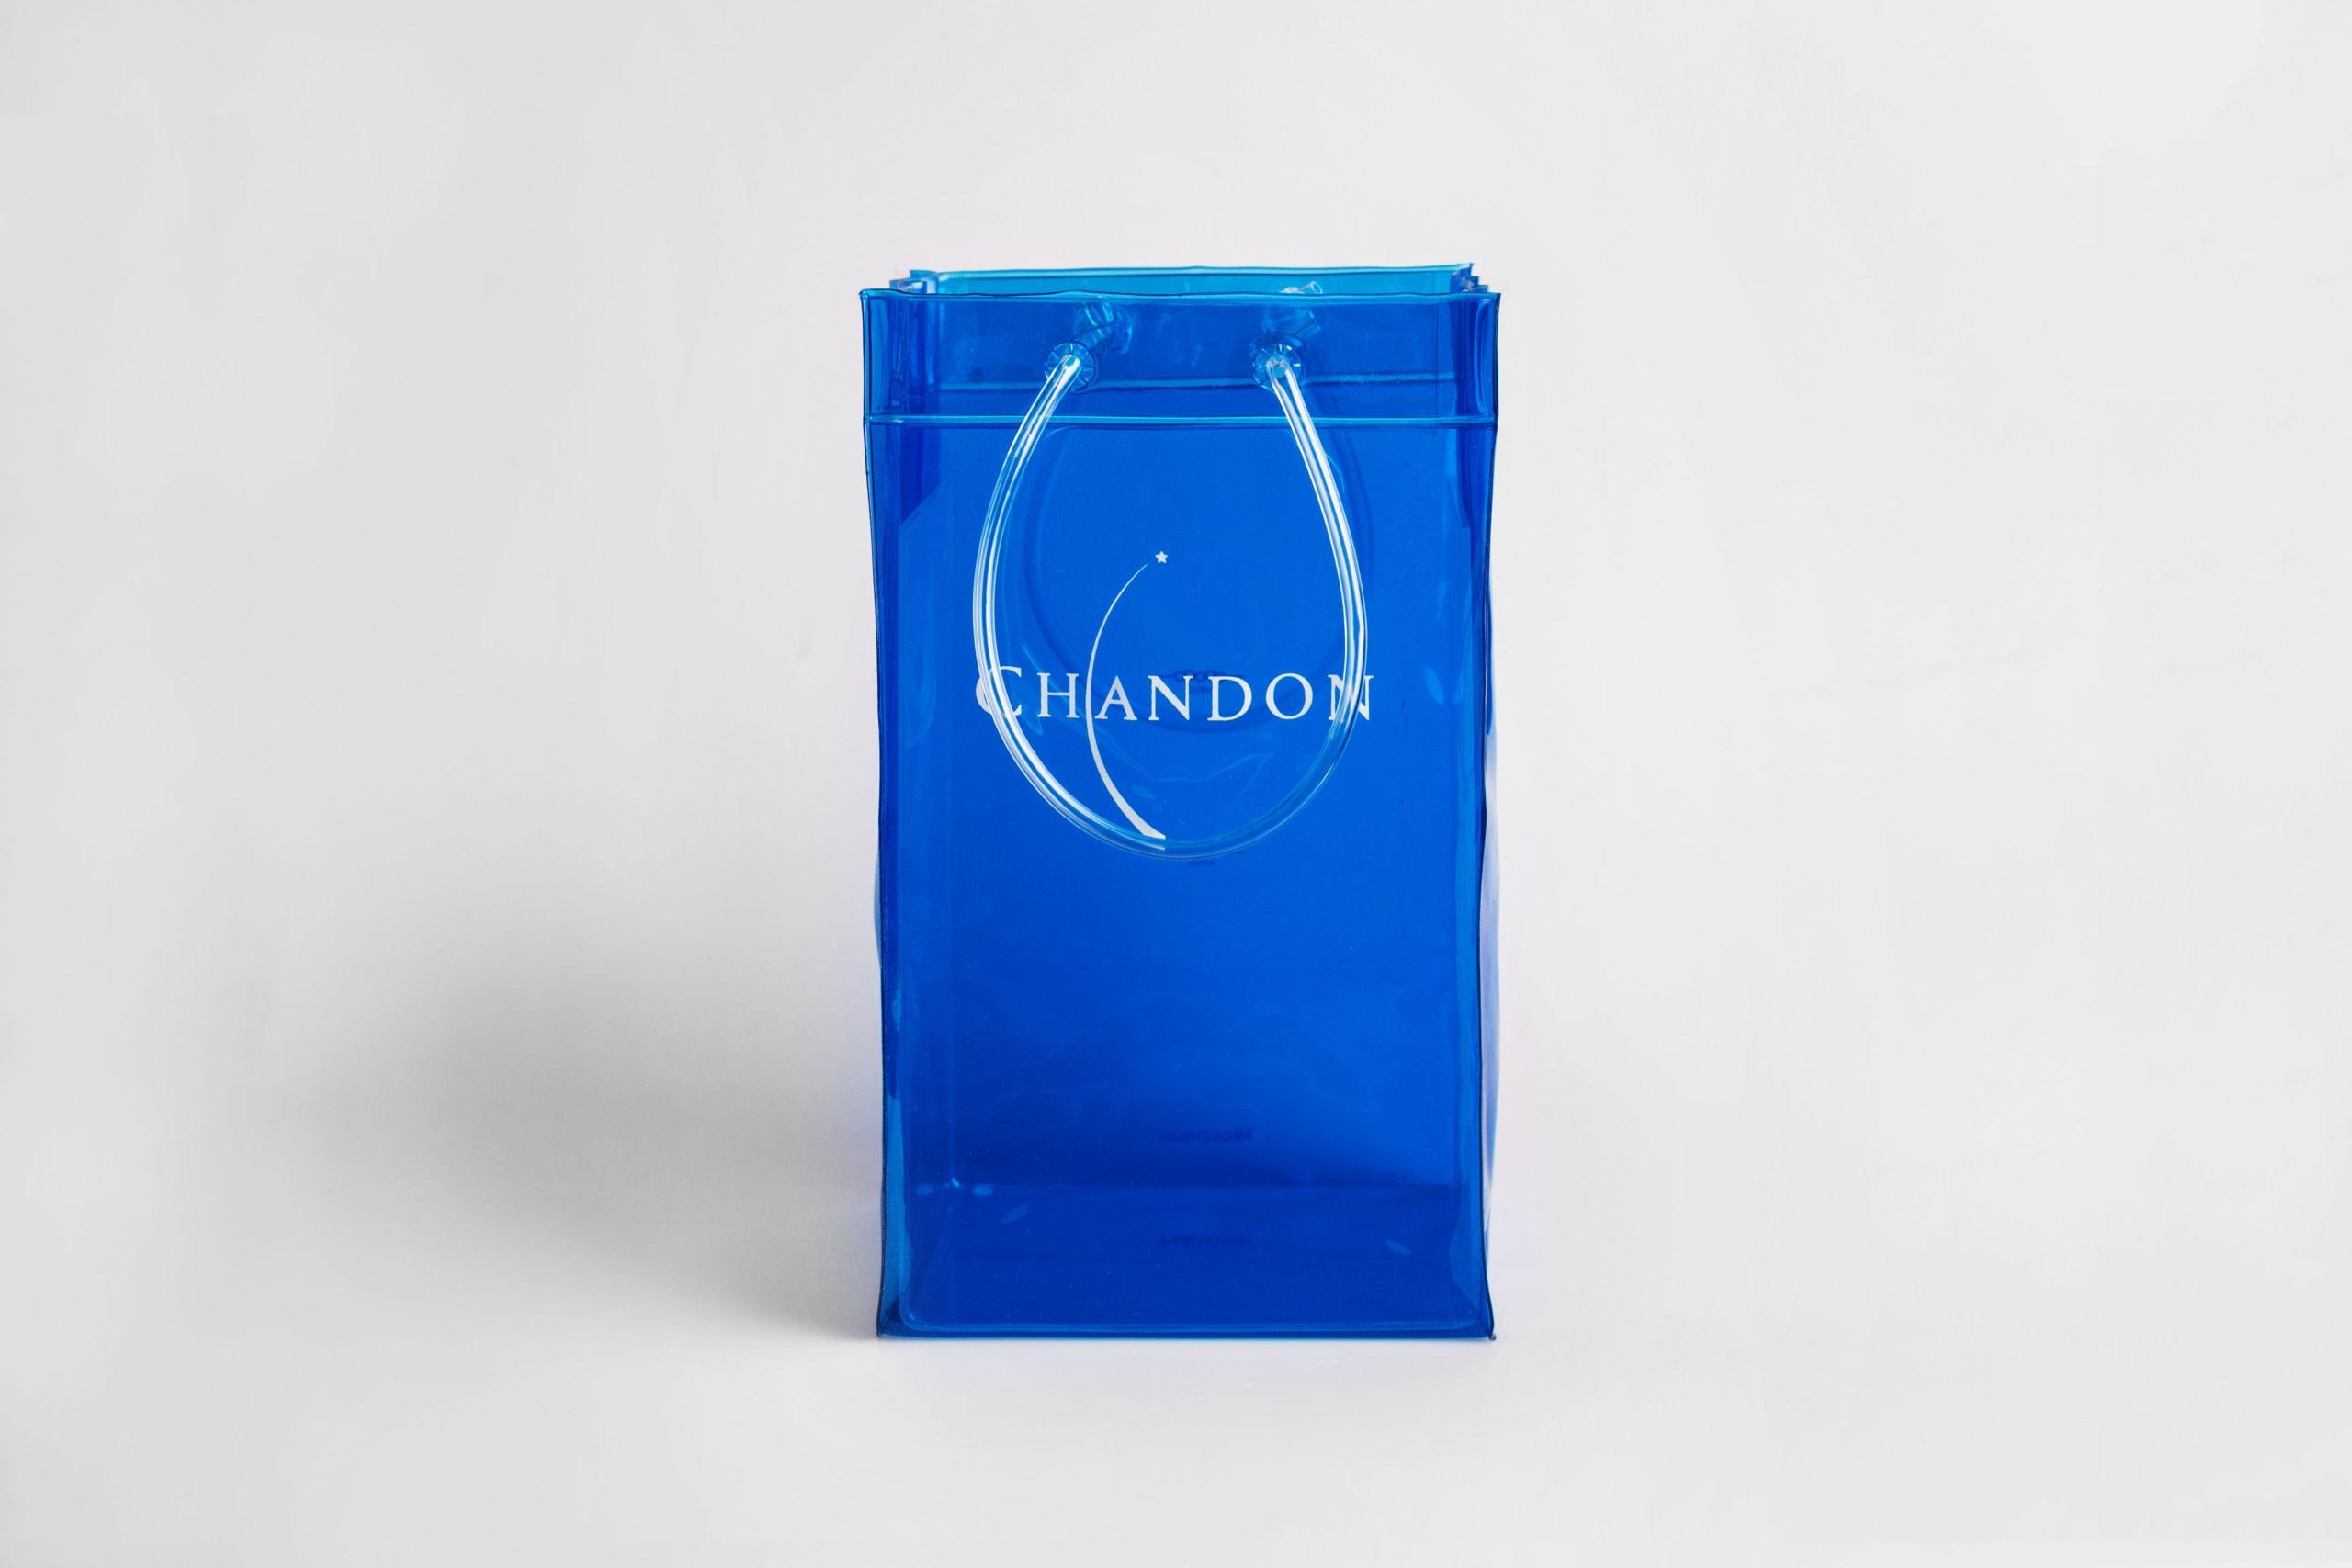 Chandon XL Blue Frente